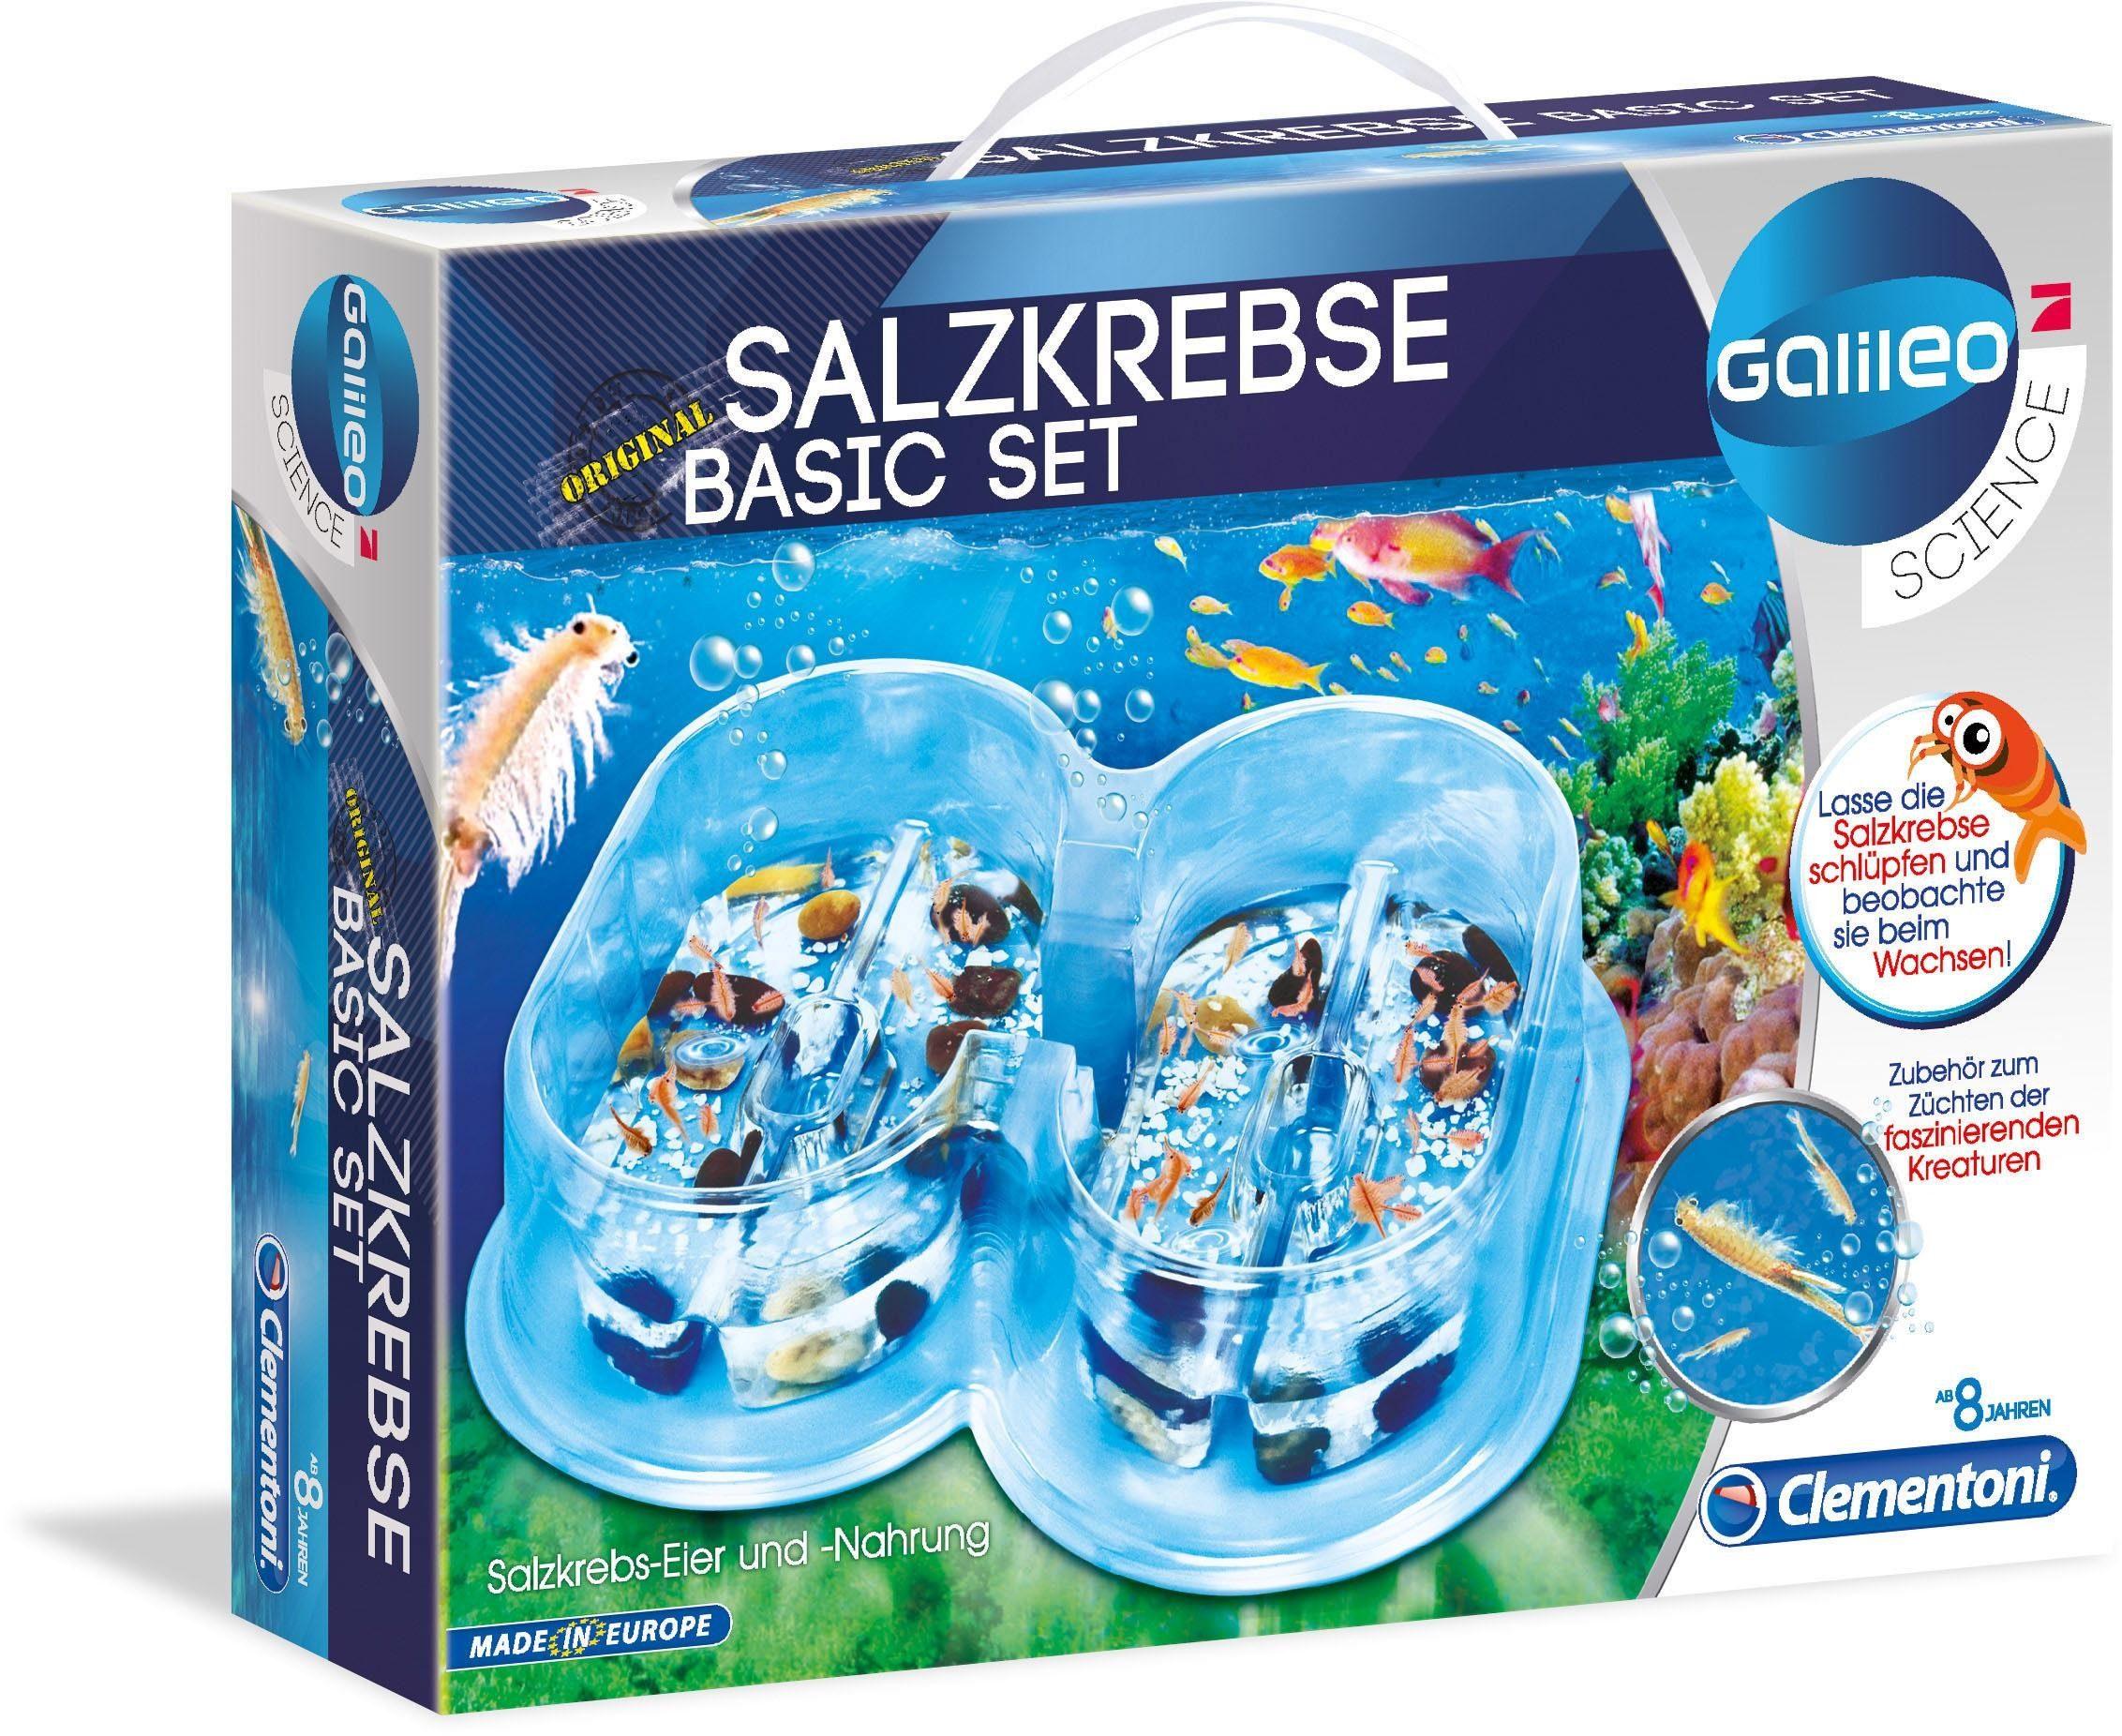 Experimentier-Set, »Galileo - Salzkrebse Basis Set«, Clementoni